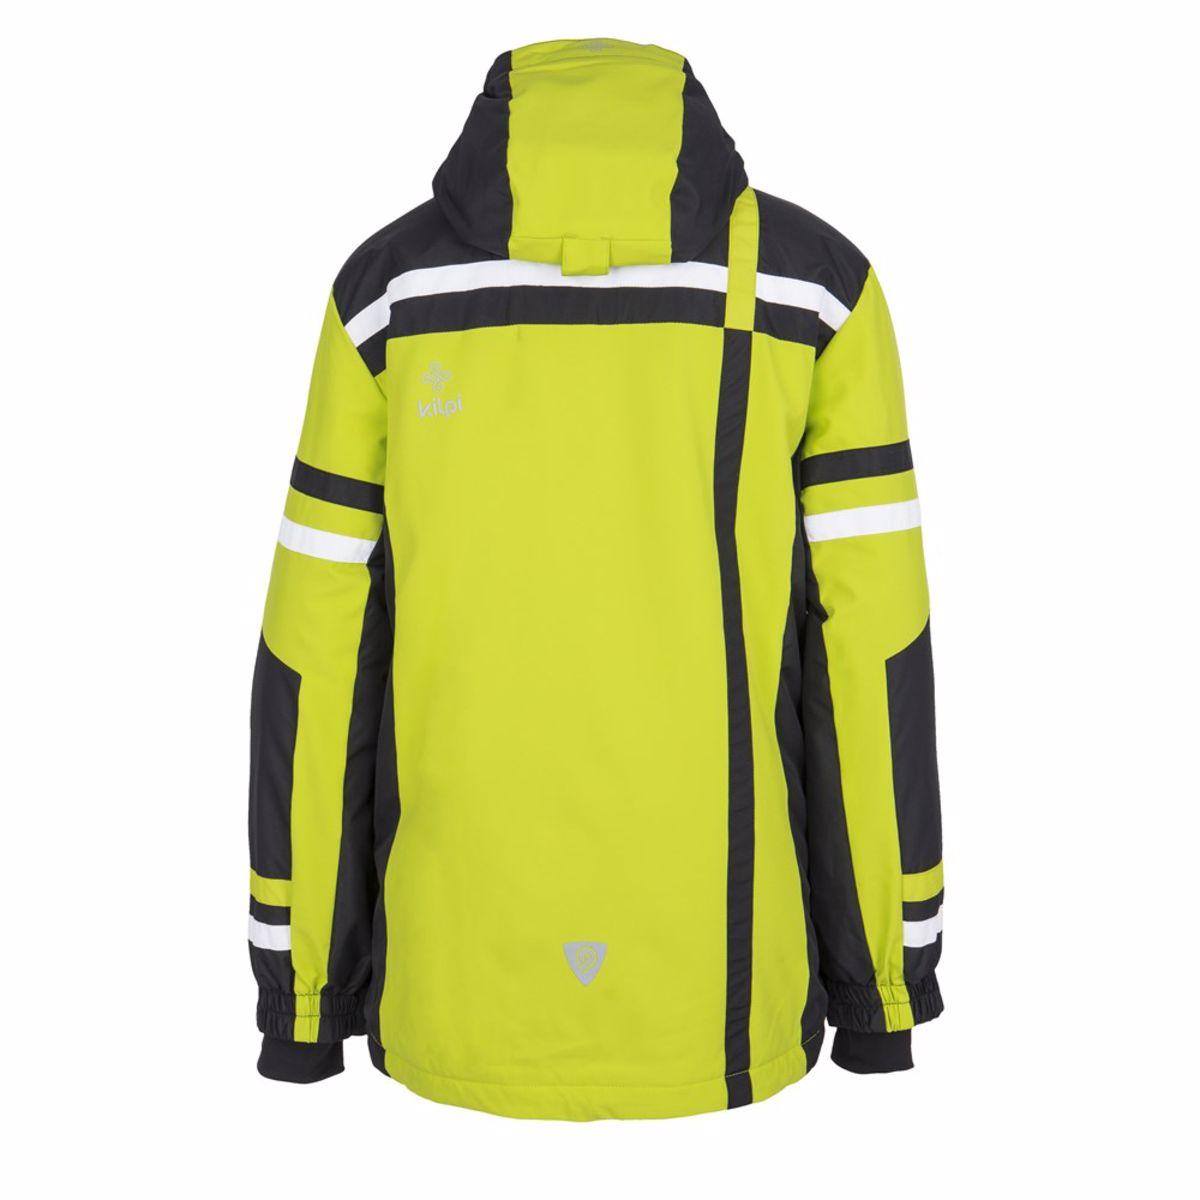 Chlapčenská zimná bunda Kilpi TITAN-JB  37fd0c8c4c1